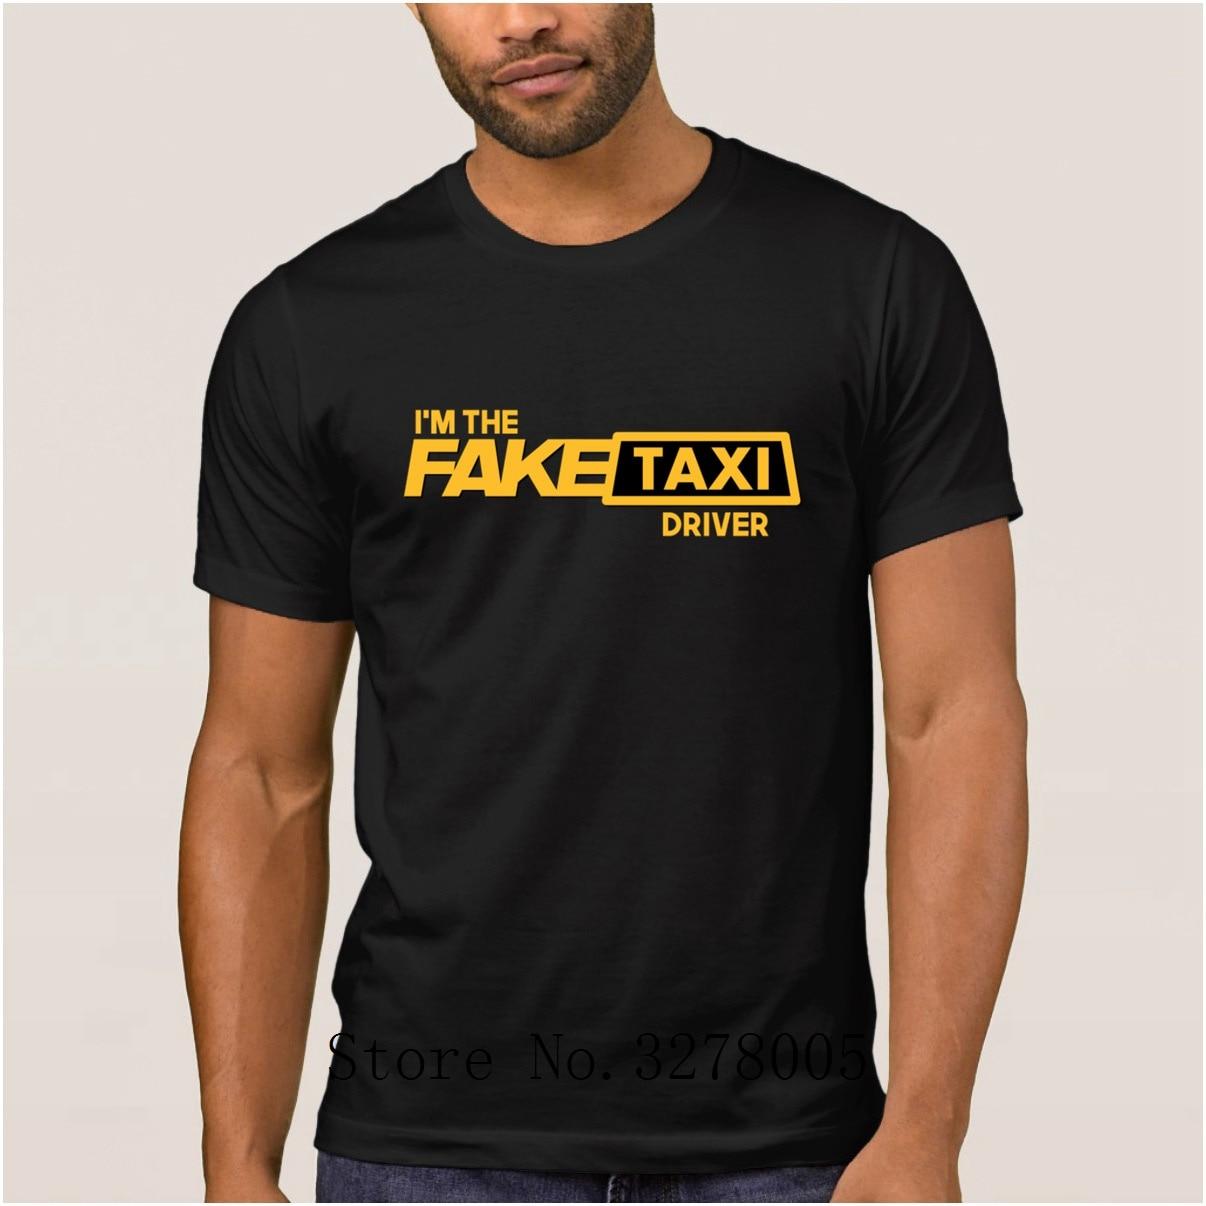 Brand La Maxpa Cool Mens T Shirt Fake Taxi Driver Regular T Shirt Sunlight 100 Cotton Clothing Tshirt Mens Top Quality